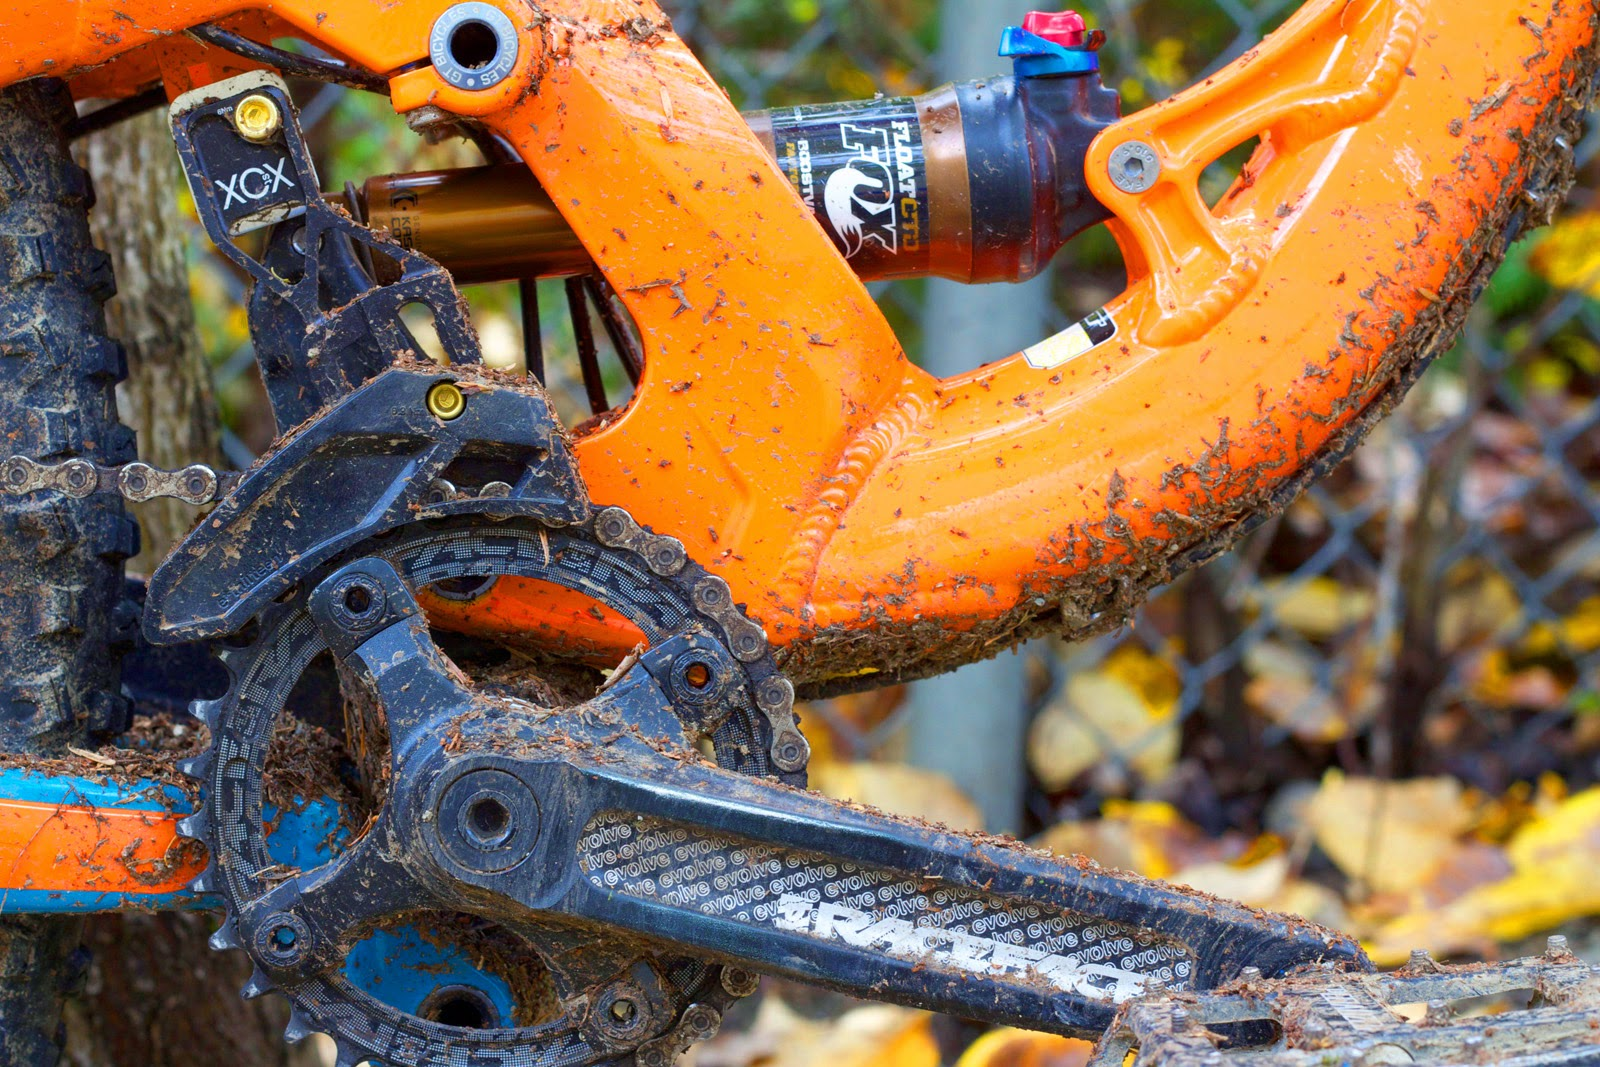 Bike News, New Bike, New Product, Suspension System, Report, GT sensor x pro, gt sensor x pro review